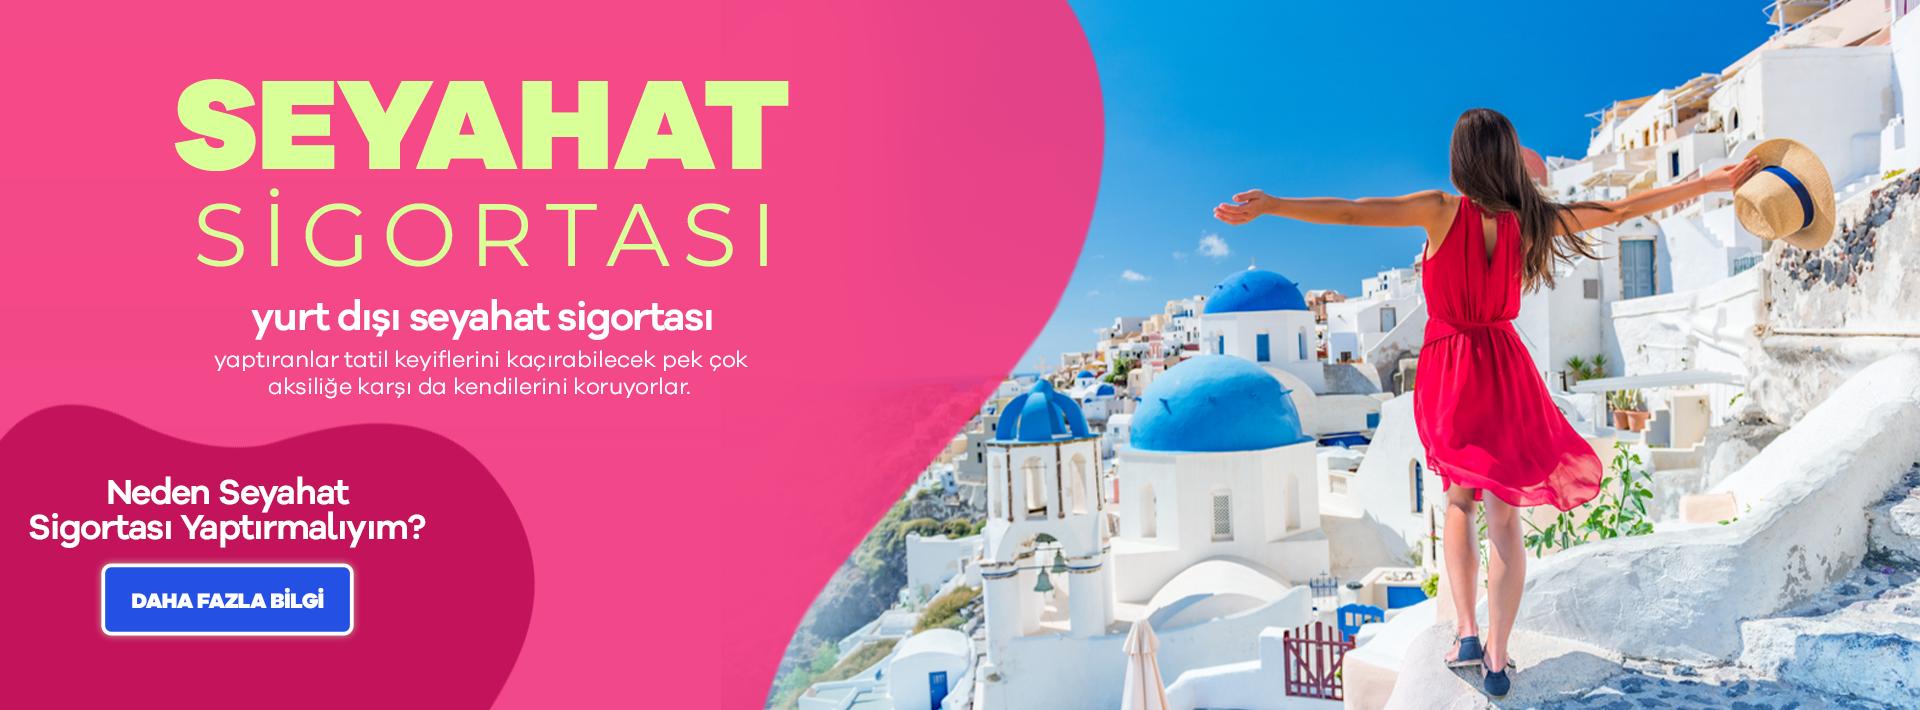 Gökyüzü Sigorta - İstanbul Maltepe Sigorta Acentesi